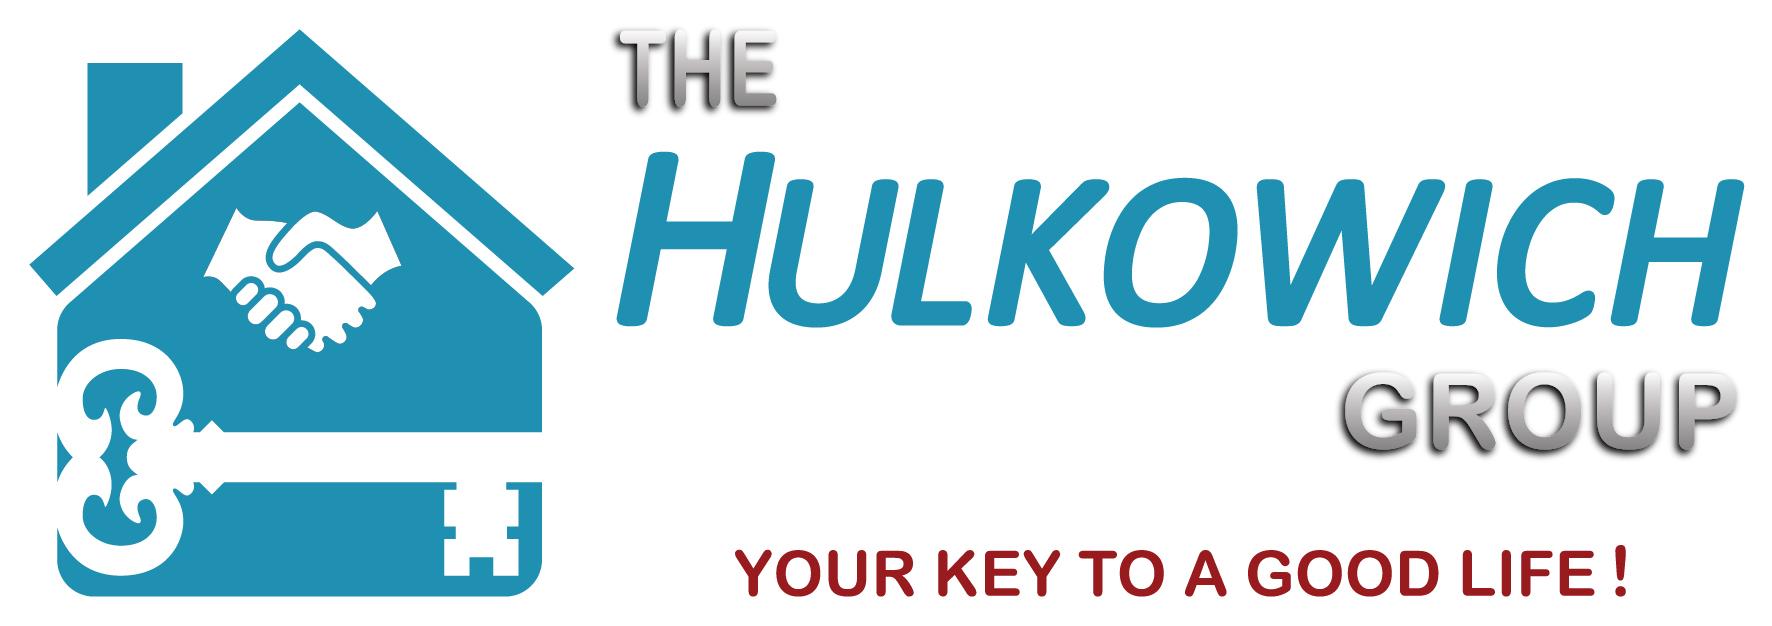 The Hulkowich Group logo